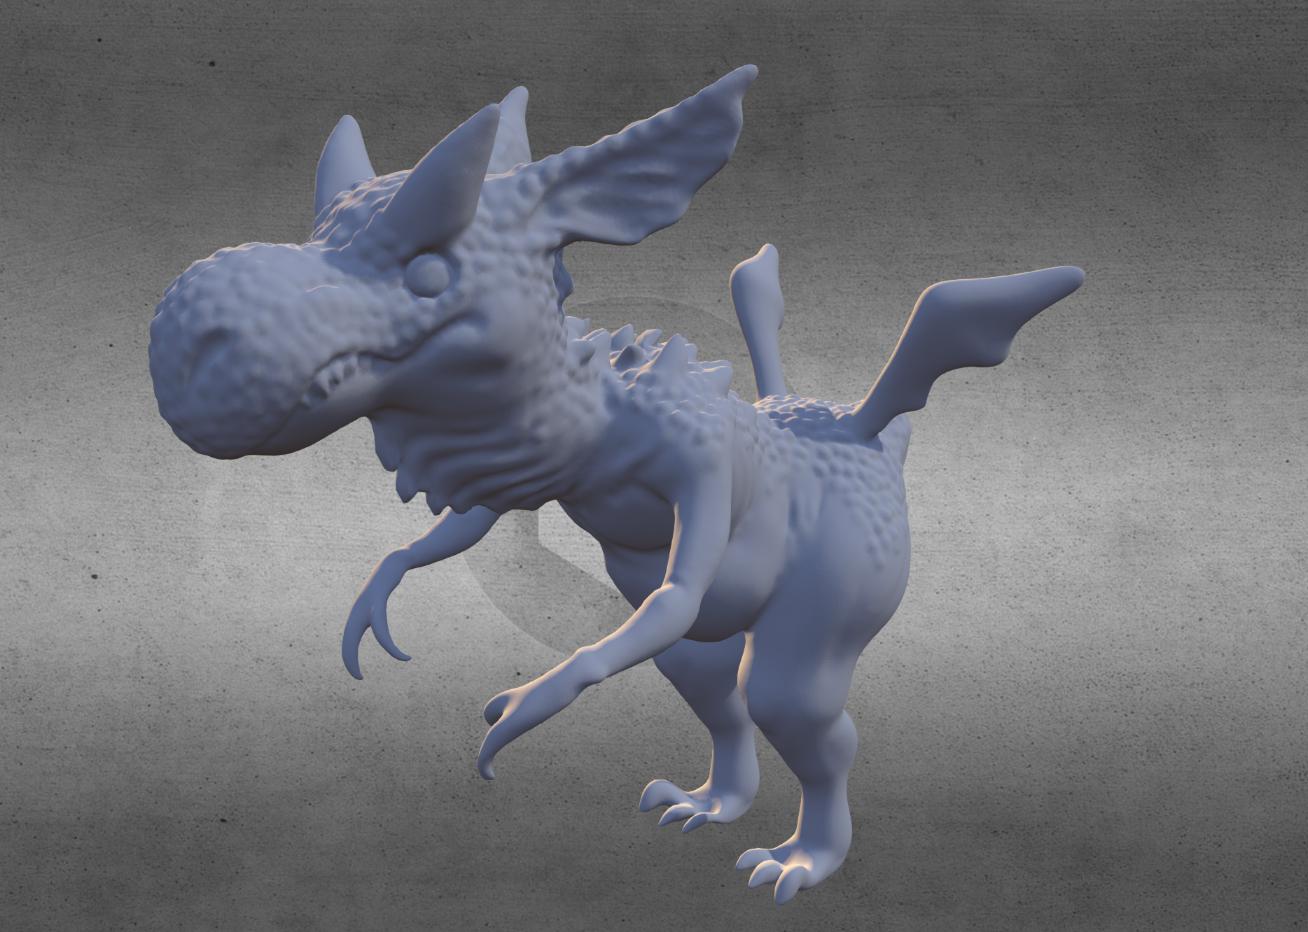 dragosaurmodel2.png